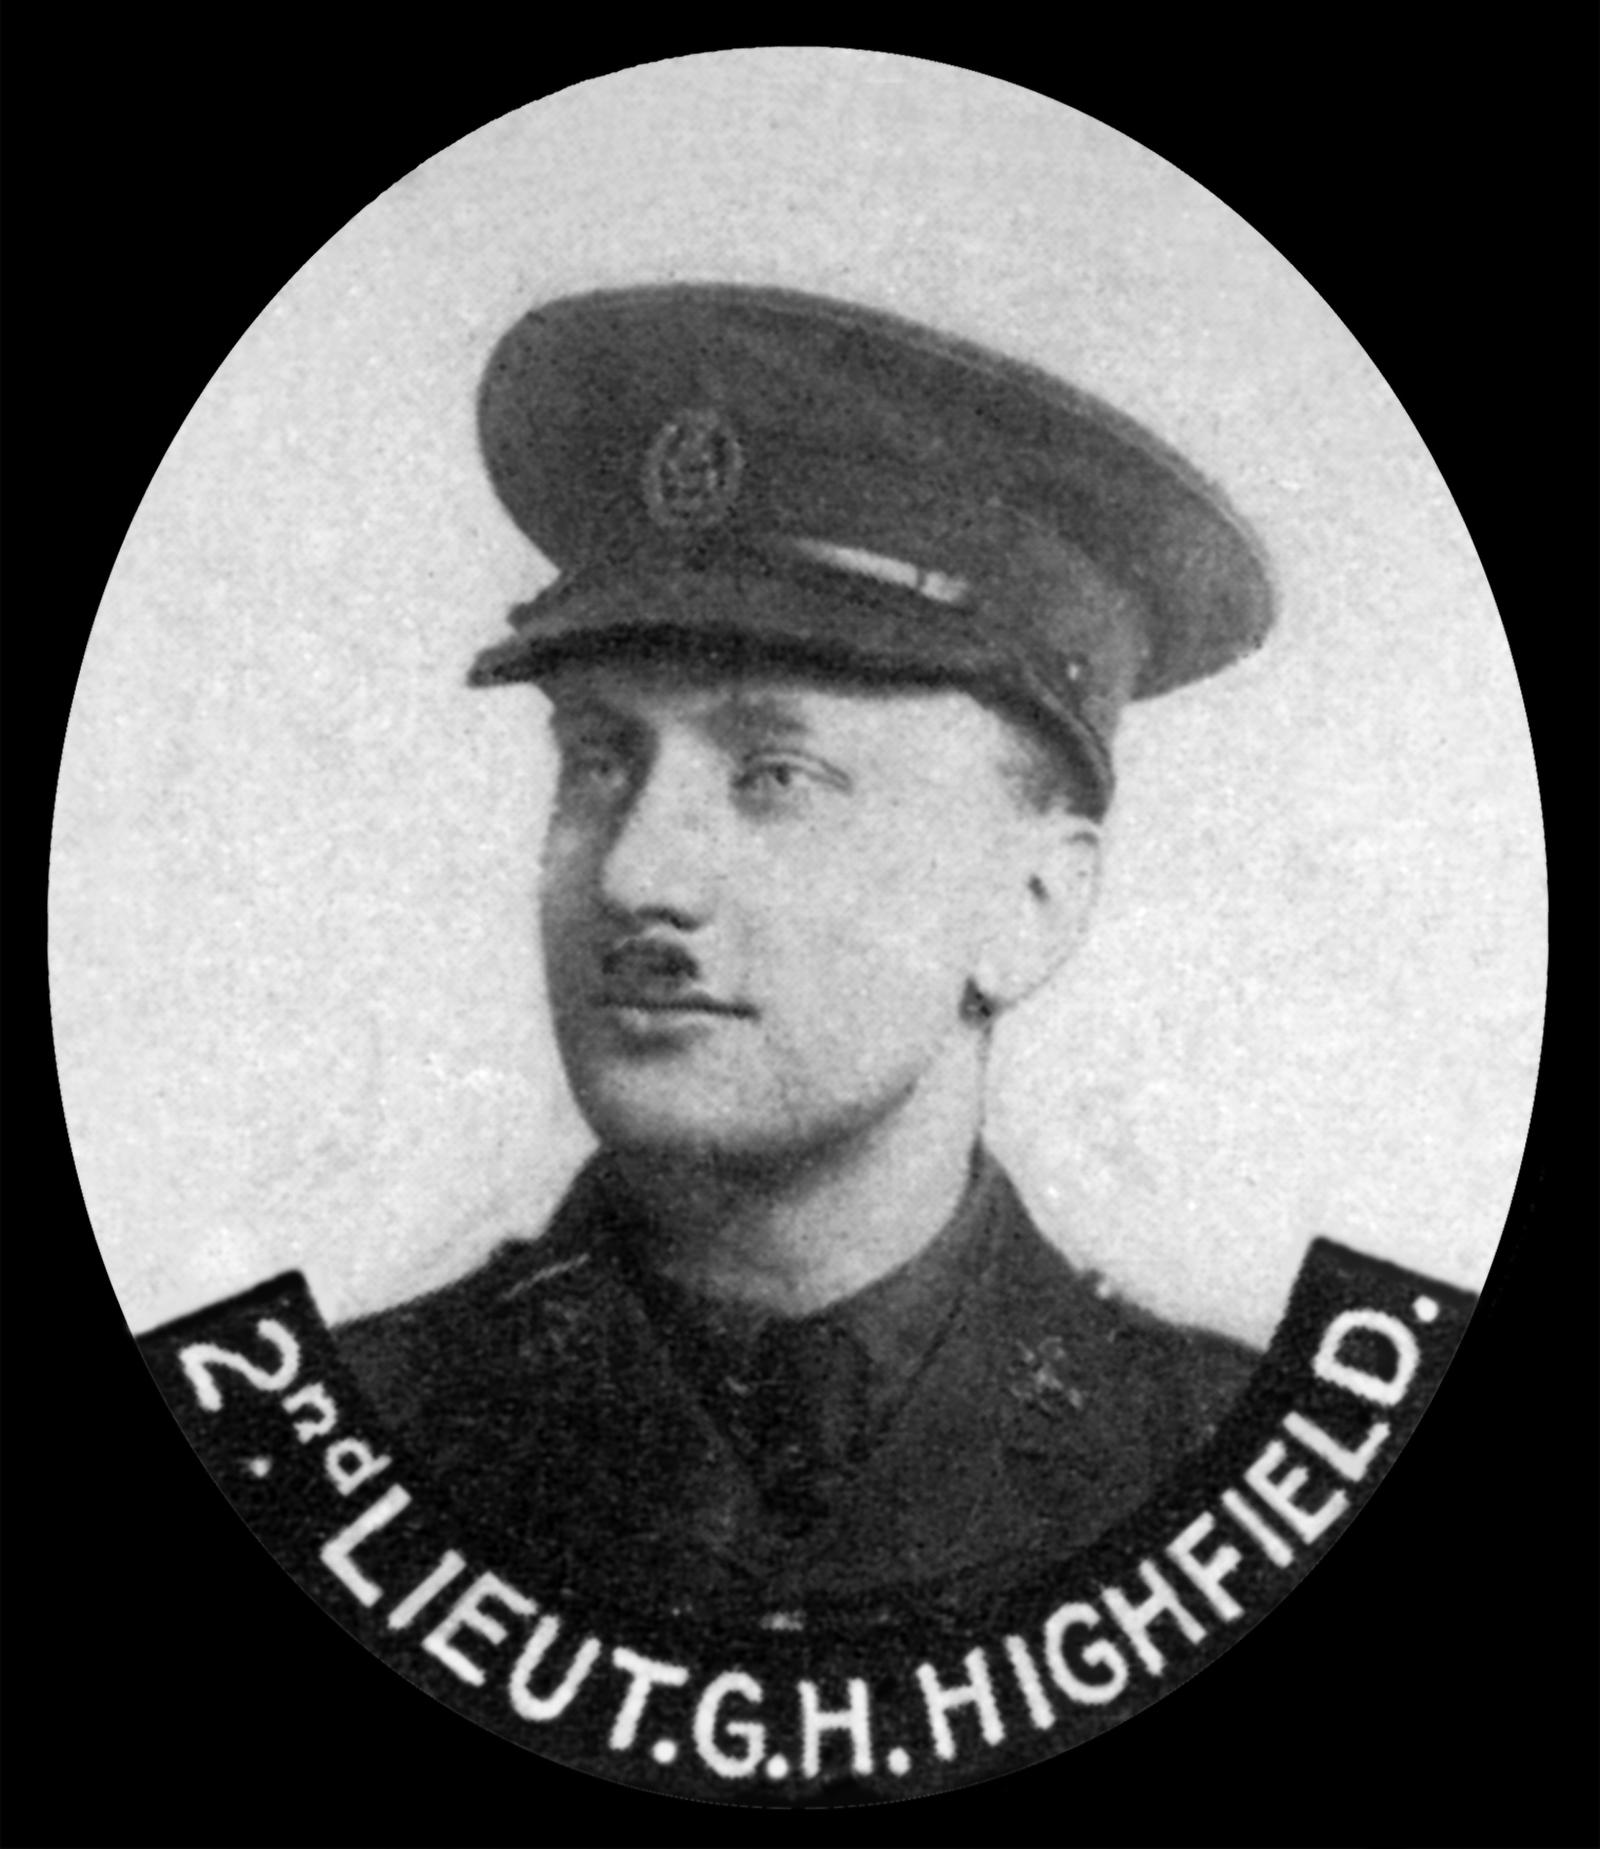 HIGHFIELD George Harold